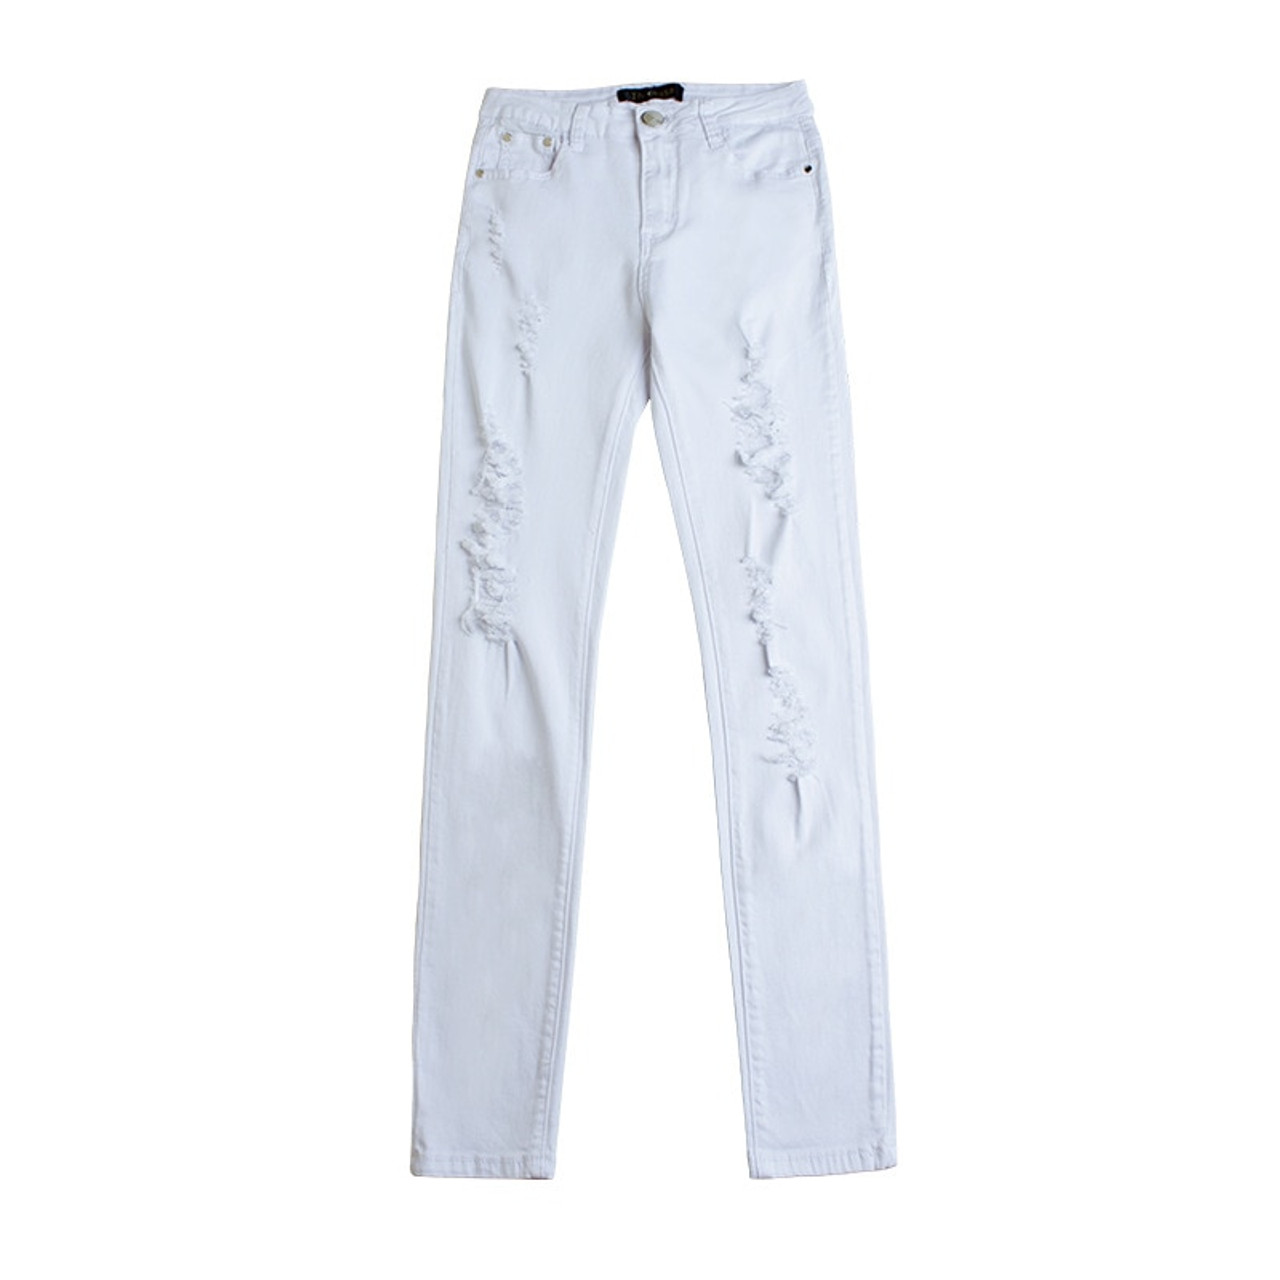 c82fb3cec ... Summer Style White Hole Ripped Jeans Women Jeggings Cool Denim High  Waist Pants Capris Female Skinny